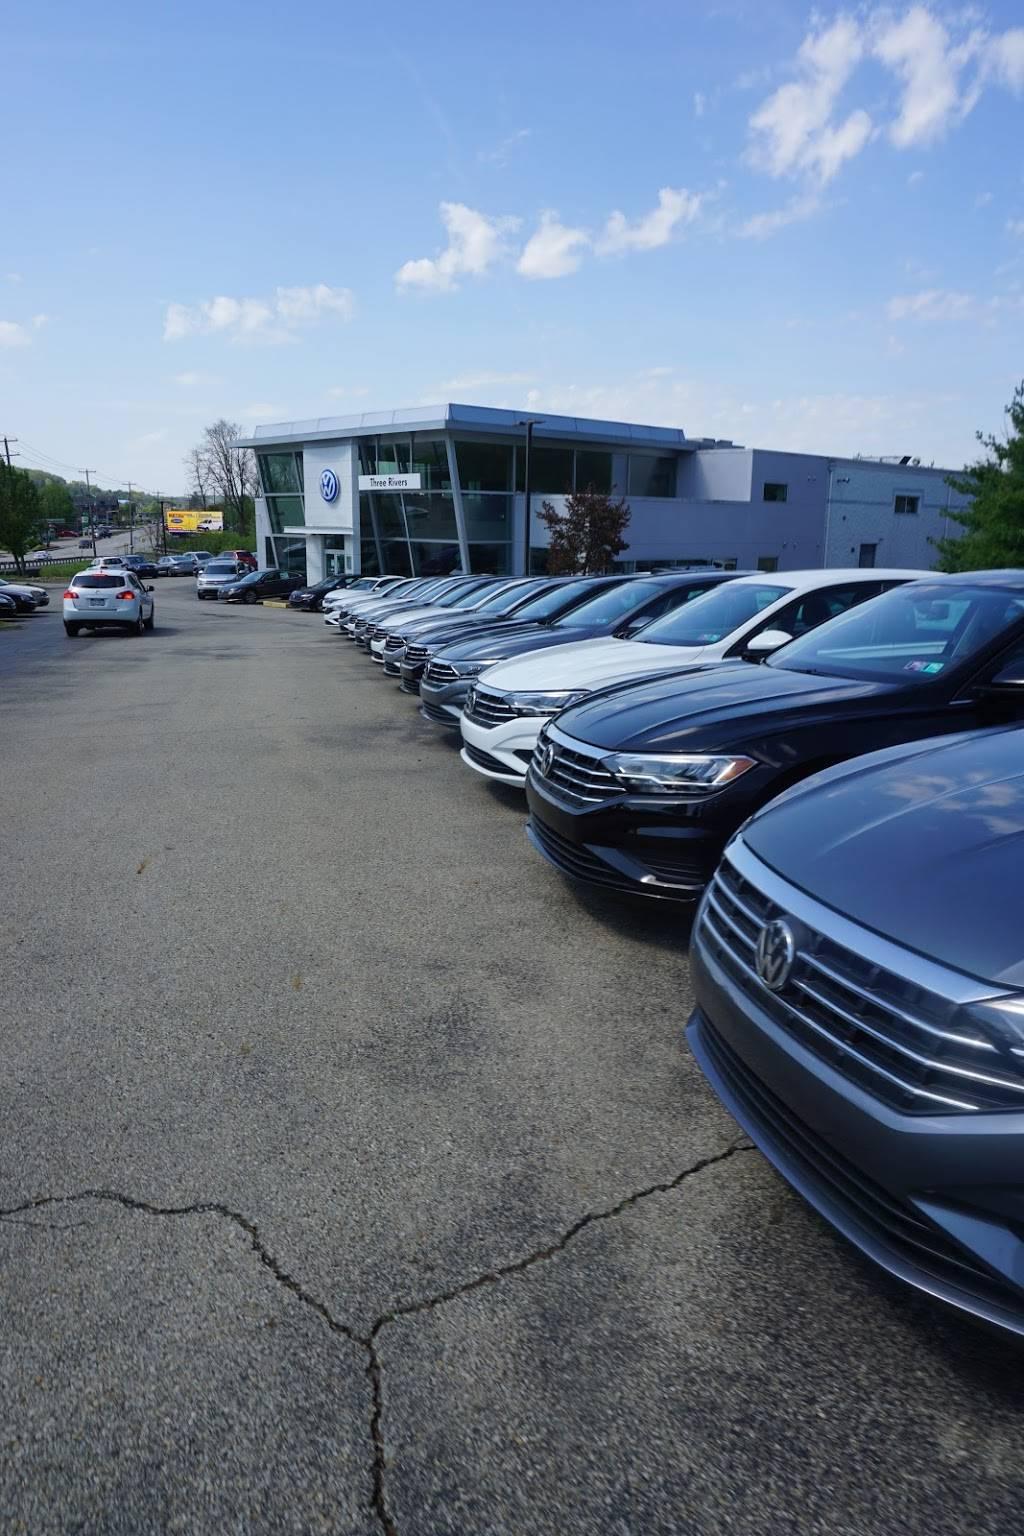 Three Rivers Volkswagen - car dealer  | Photo 8 of 8 | Address: 3694 Washington Rd, McMurray, PA 15317, USA | Phone: (724) 941-6100